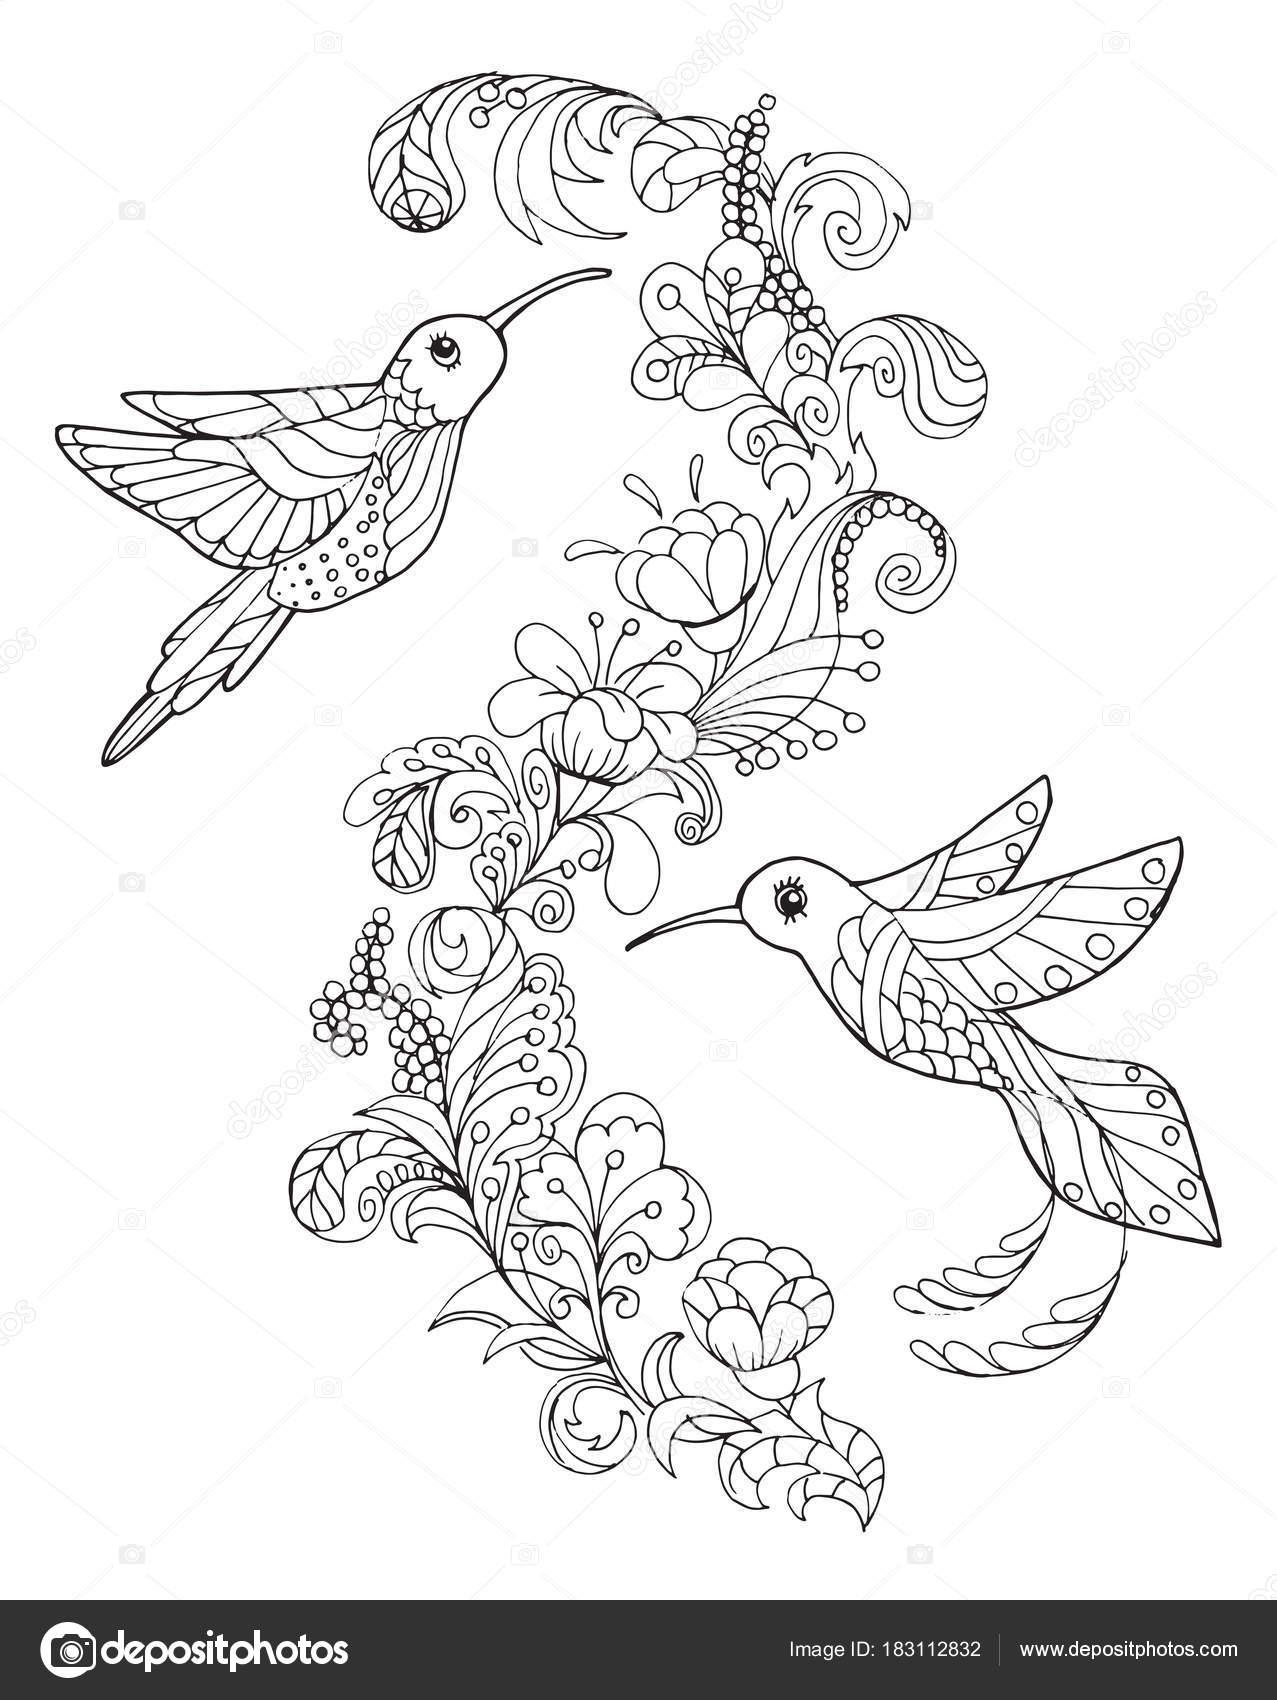 Hummingbird Coloring Book Stock Vector C Snowkat 183112832